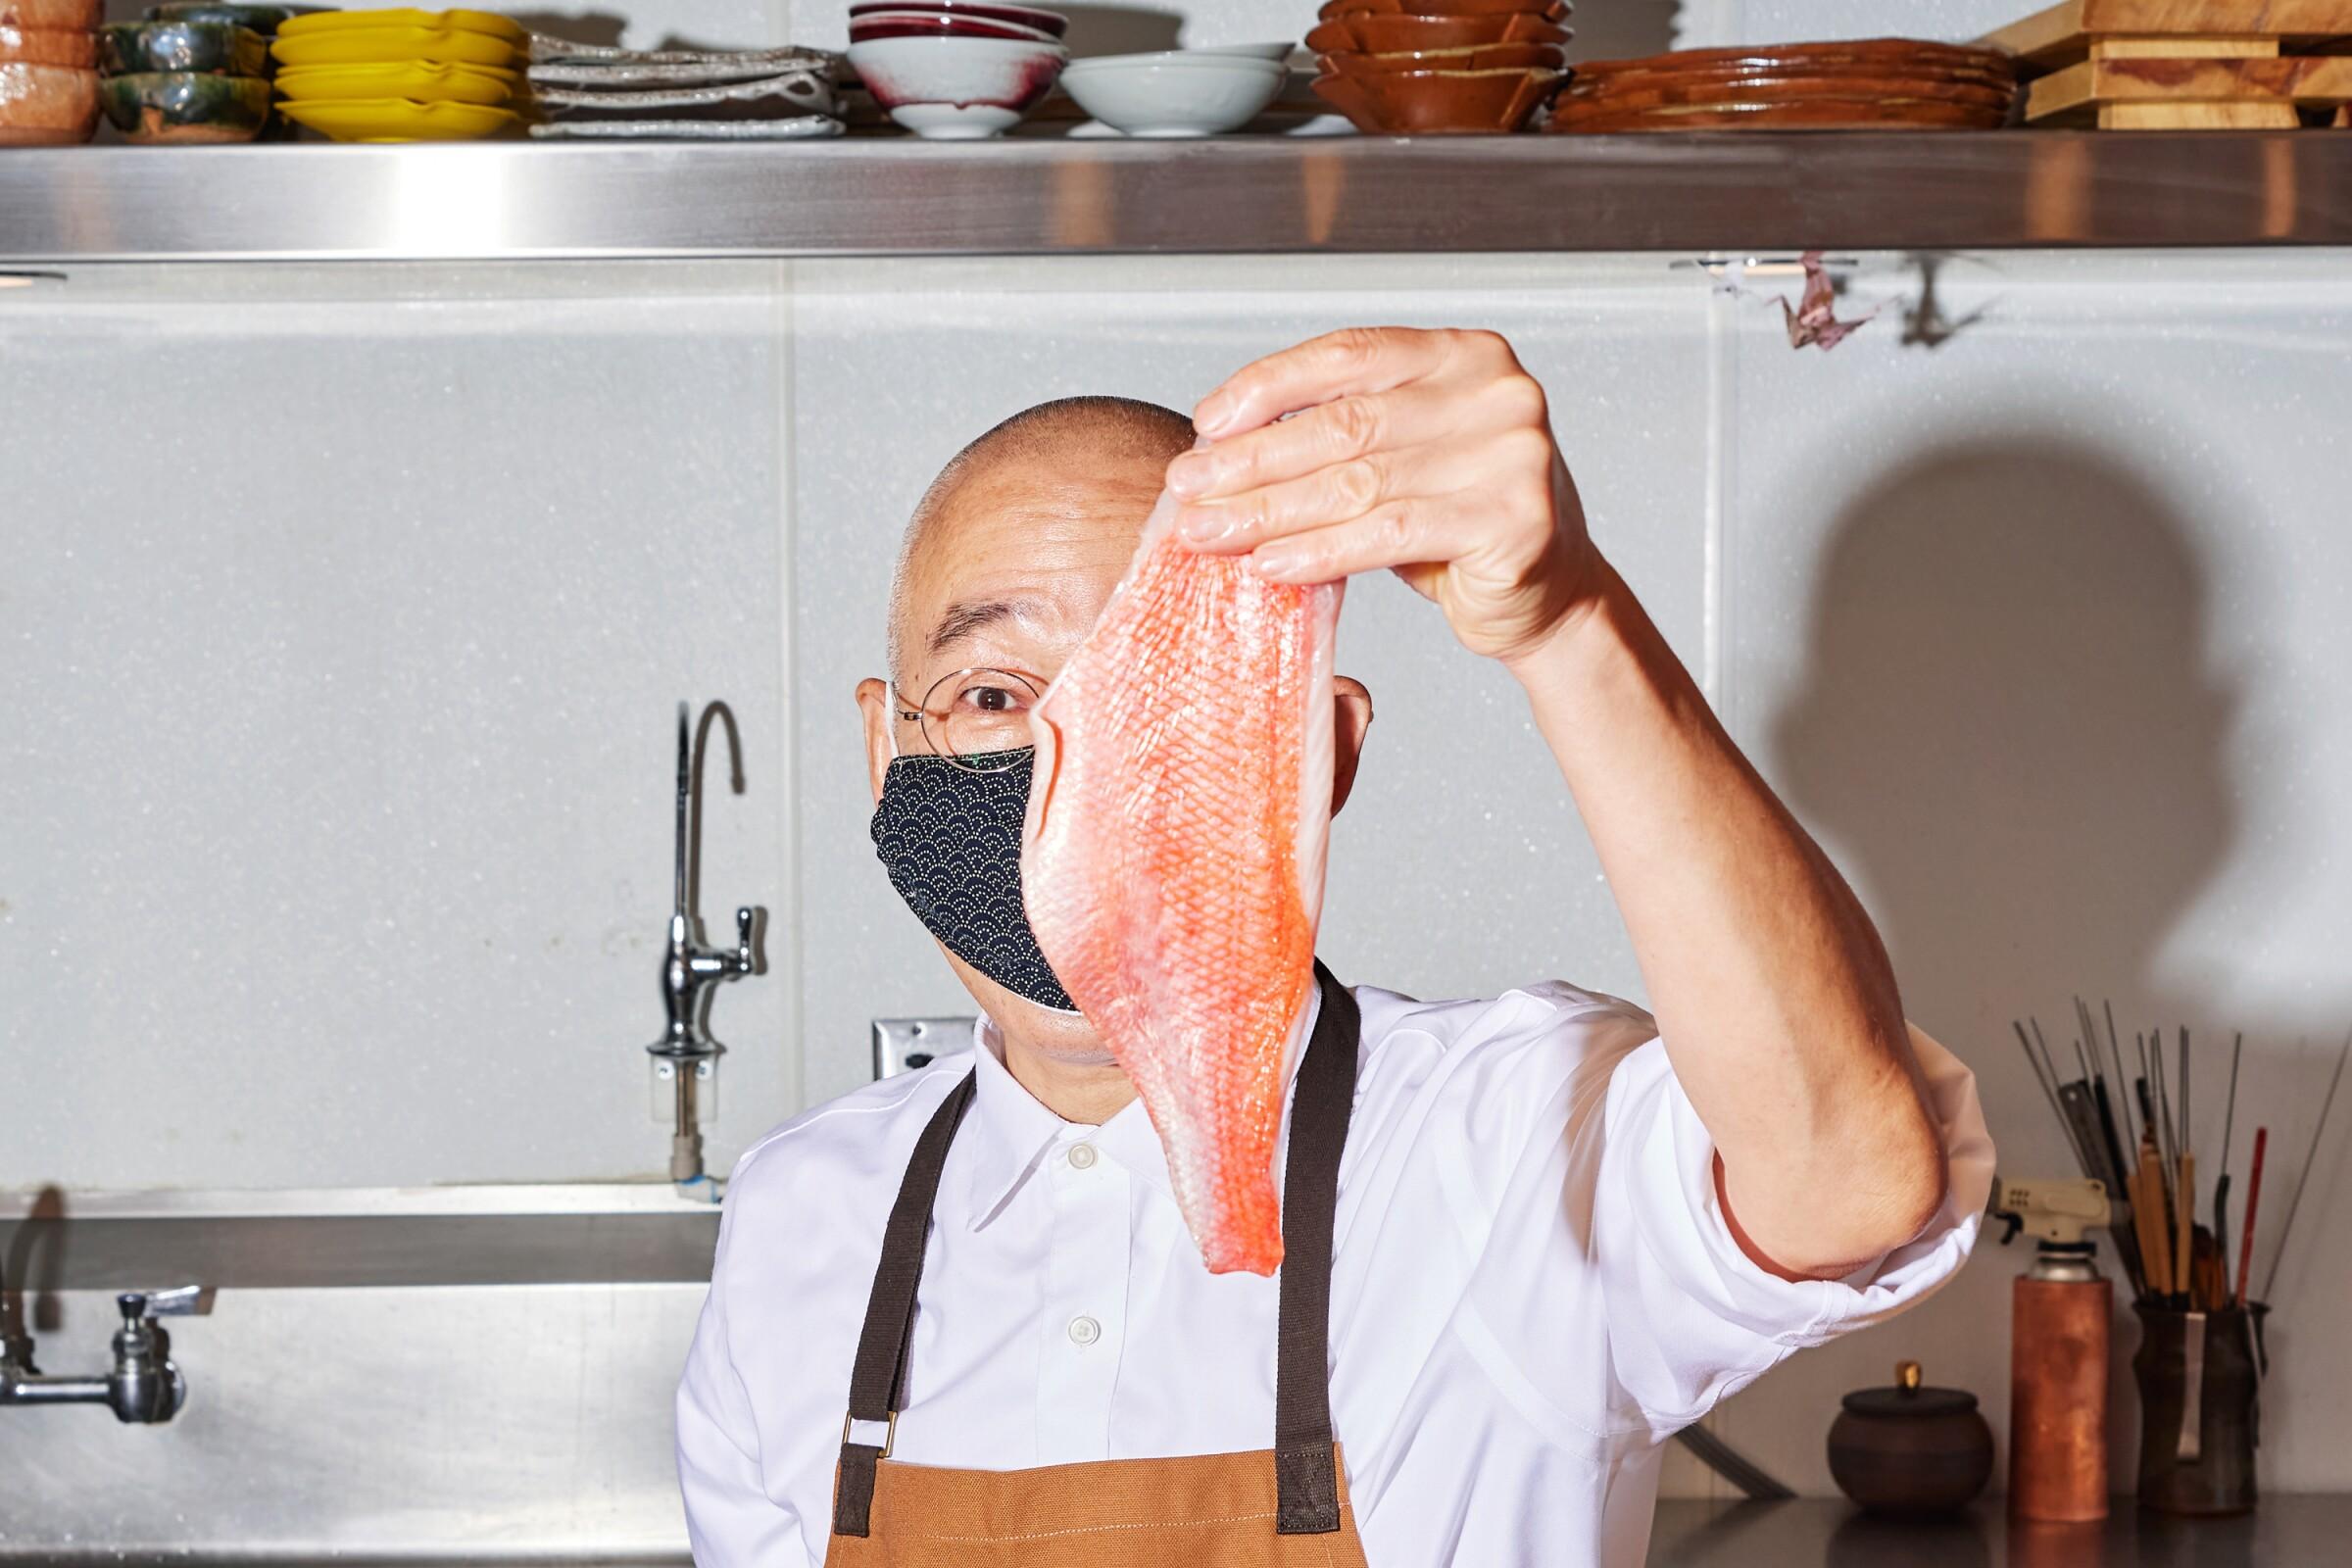 Sushi chef Morihiro Onadera holds up a filleted fish.